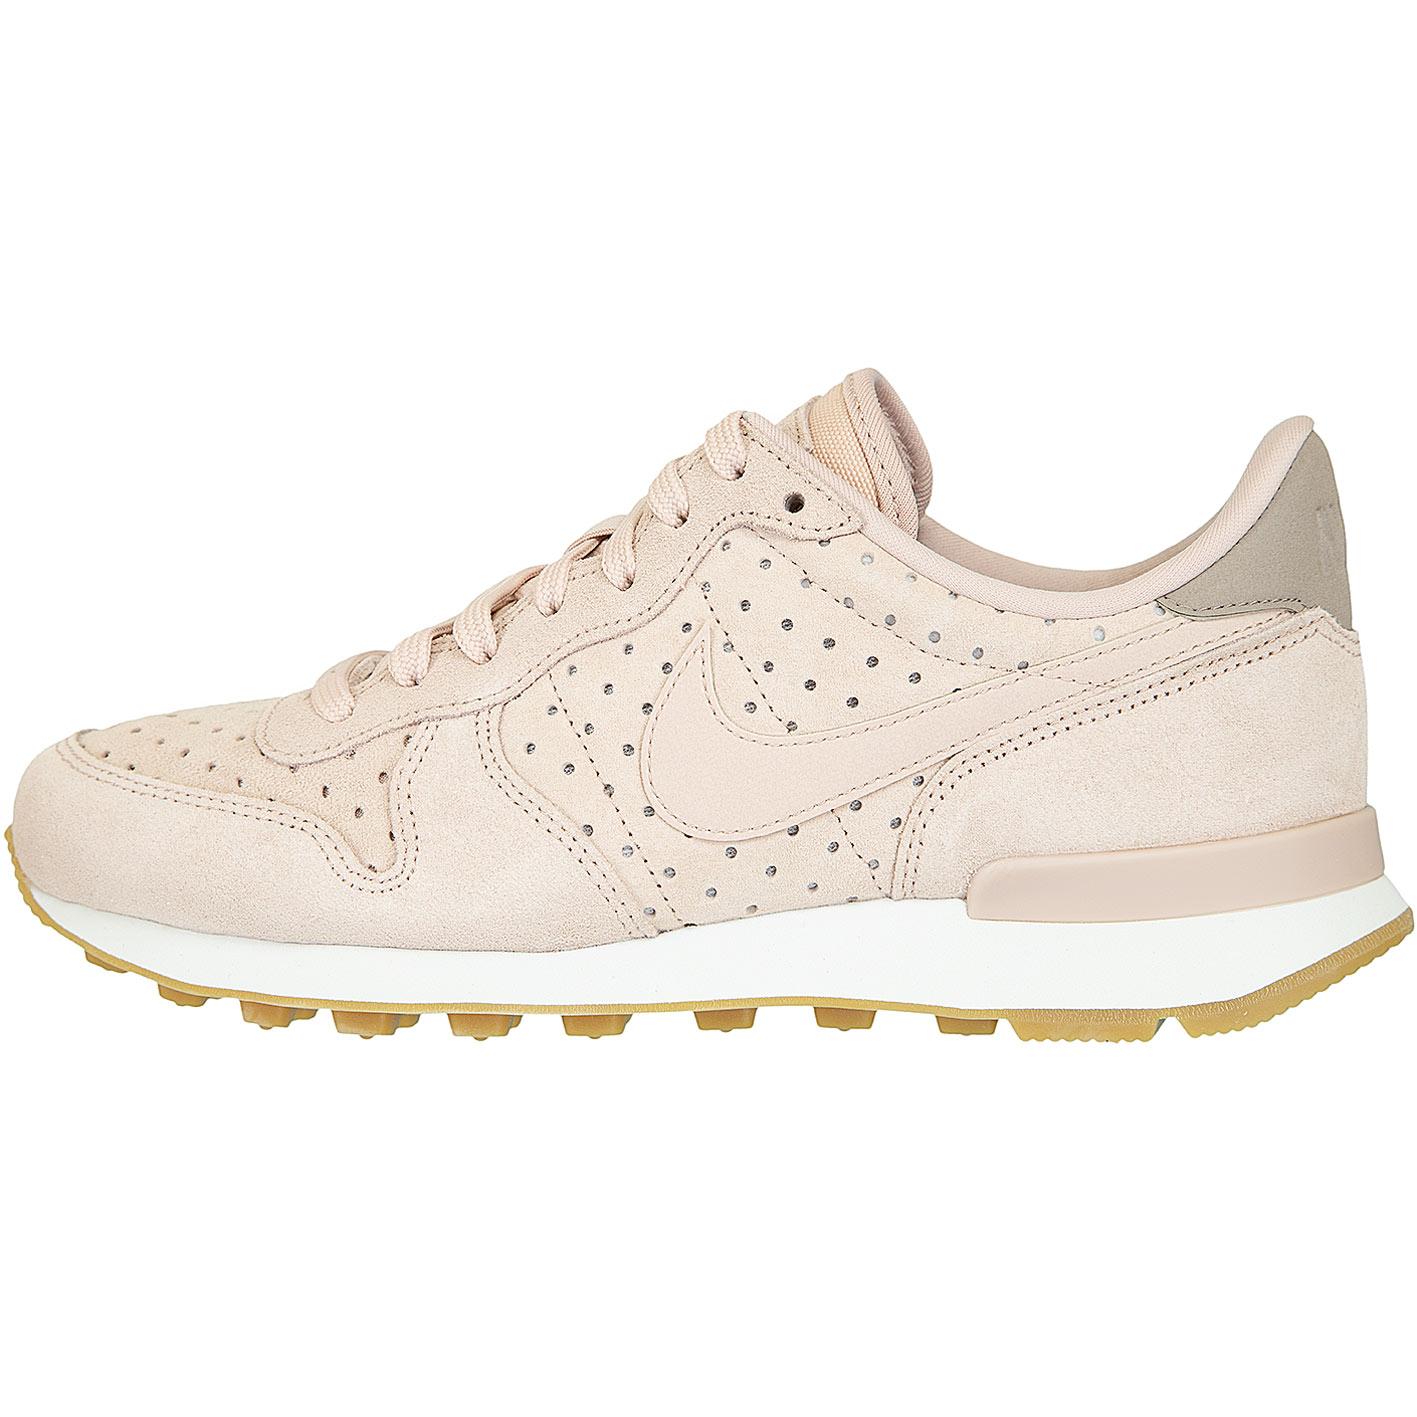 uk availability 2191f 7b24f Nike Damen Sneaker Internationalist Premium rosa